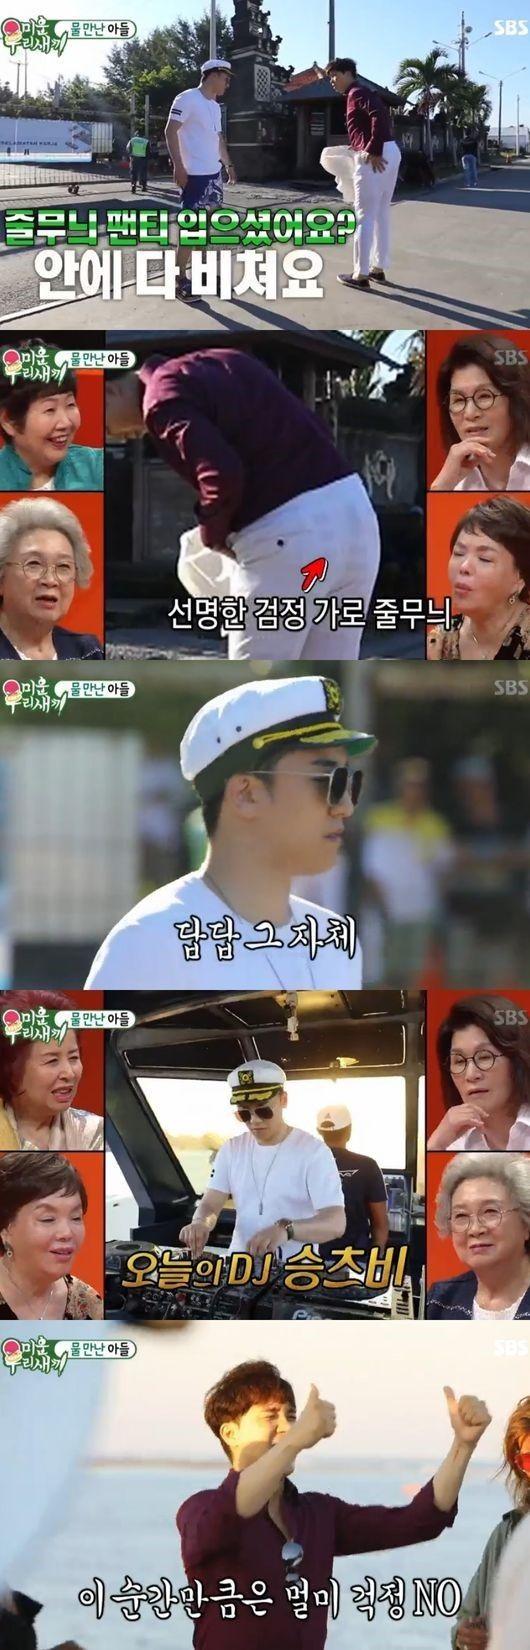 【BIGBANG NEWS】BIGBANGのV.I、豪華な船上パーティを開催…パク・スホンのファッションを指摘「パンツが透けて見える」(動画あり)